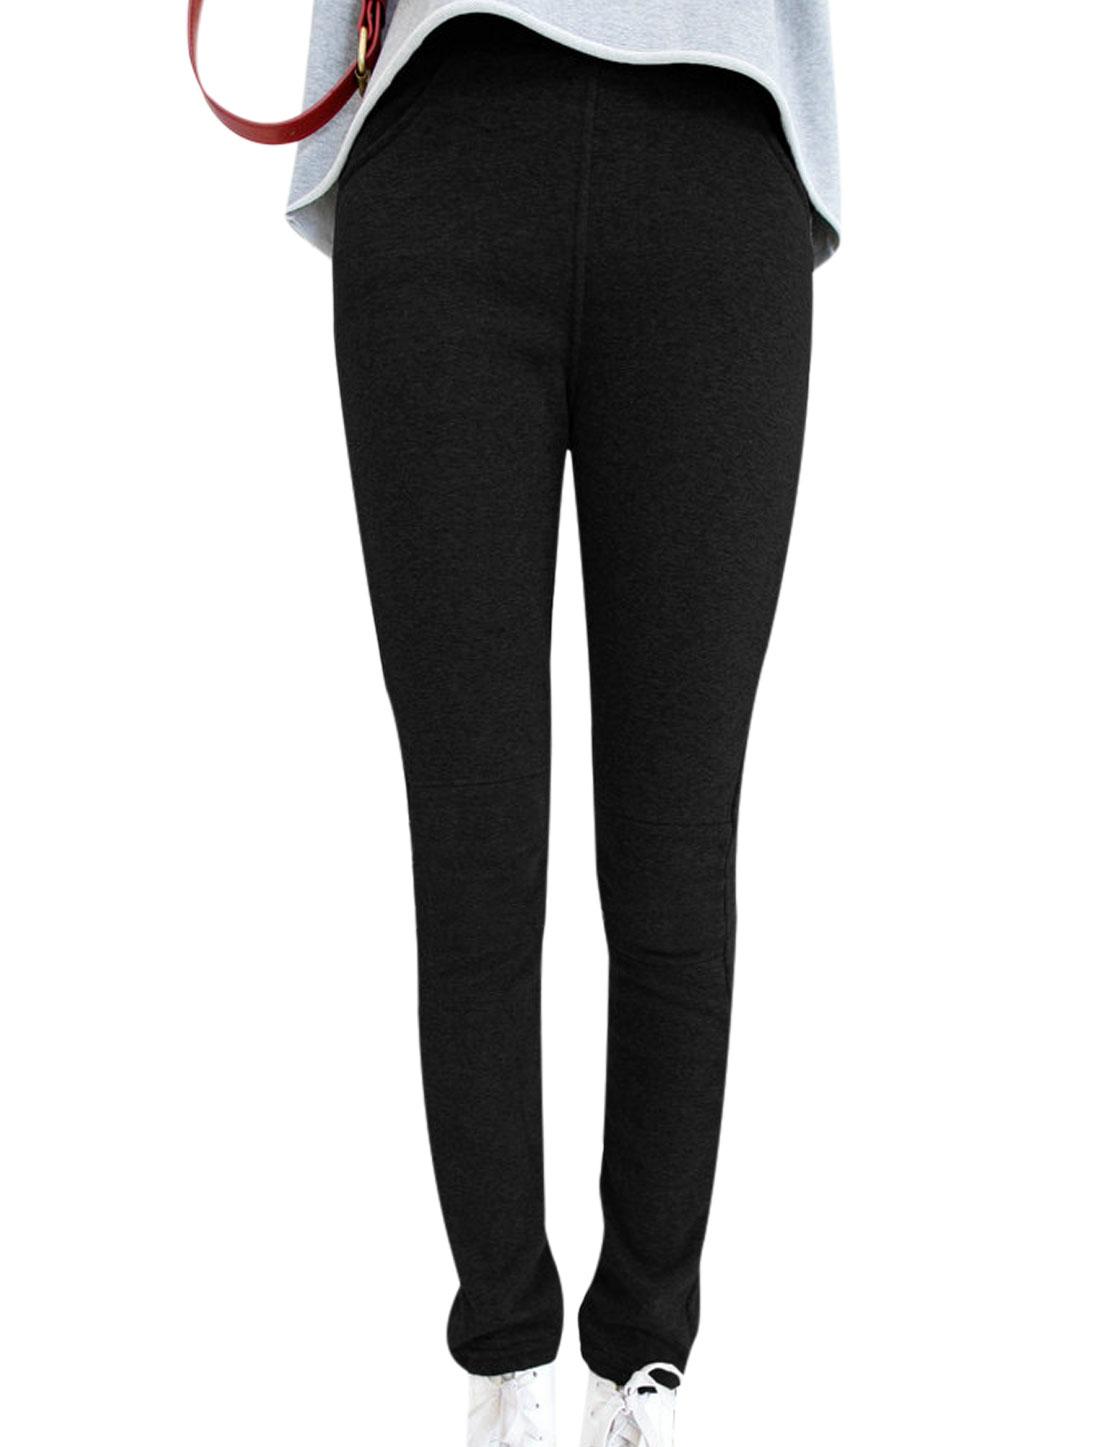 Ladies Black Mid Rise Elastic Waist Slim Fit Fleece Lining Leggings XS